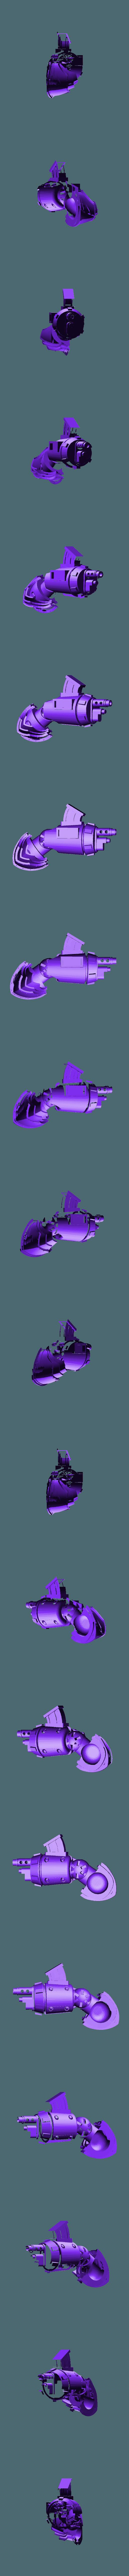 Grimdark_Kastelan_gun.stl Download free STL file Grimdark Chrono Trigger Bits • 3D printer object, ErikTheHeretek